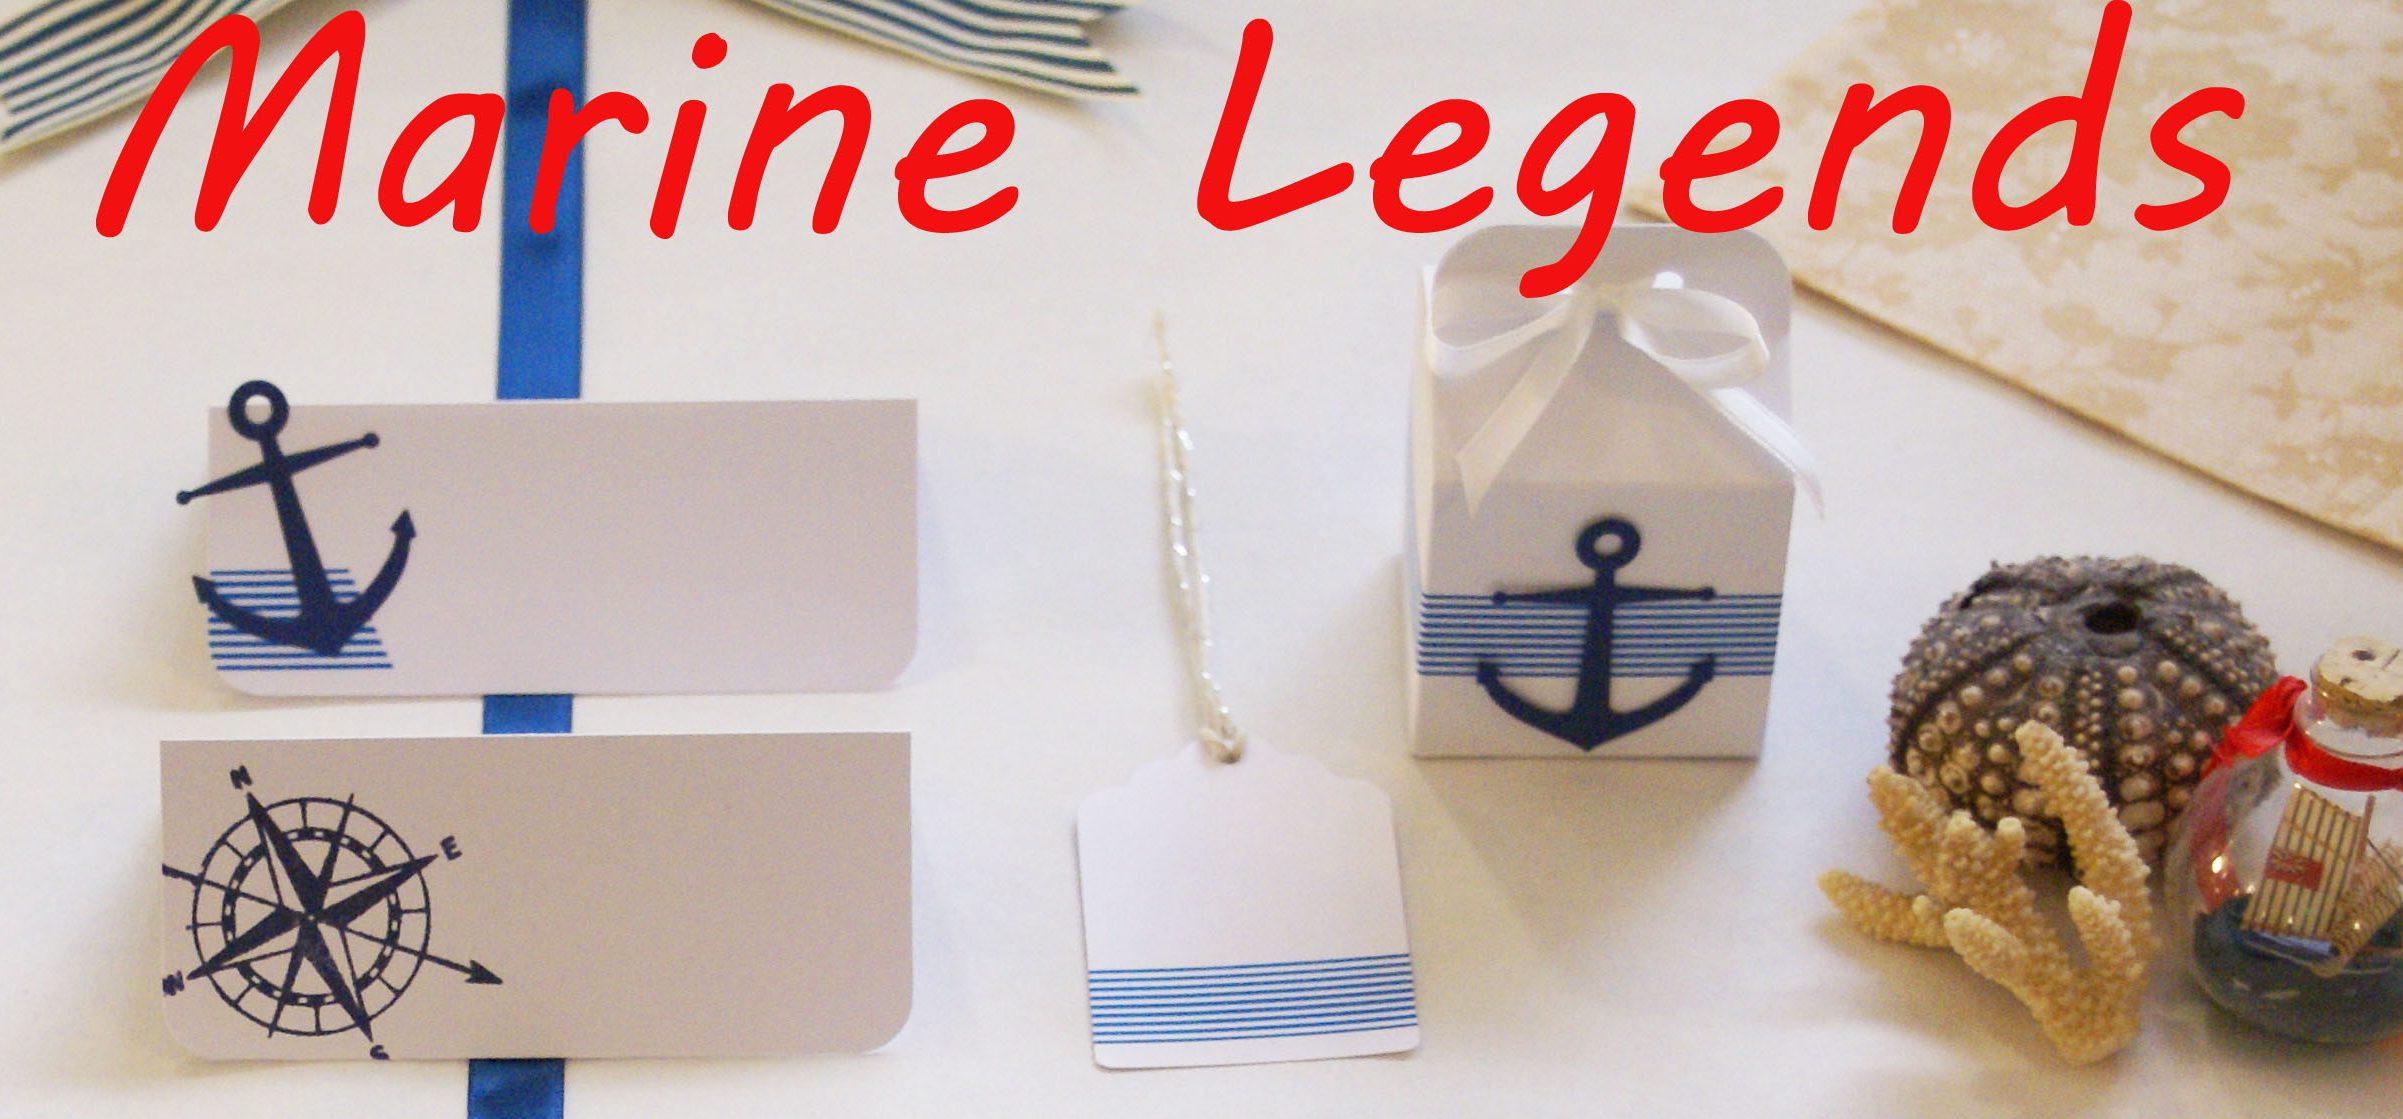 cropped-marinelegends-1-1.jpg